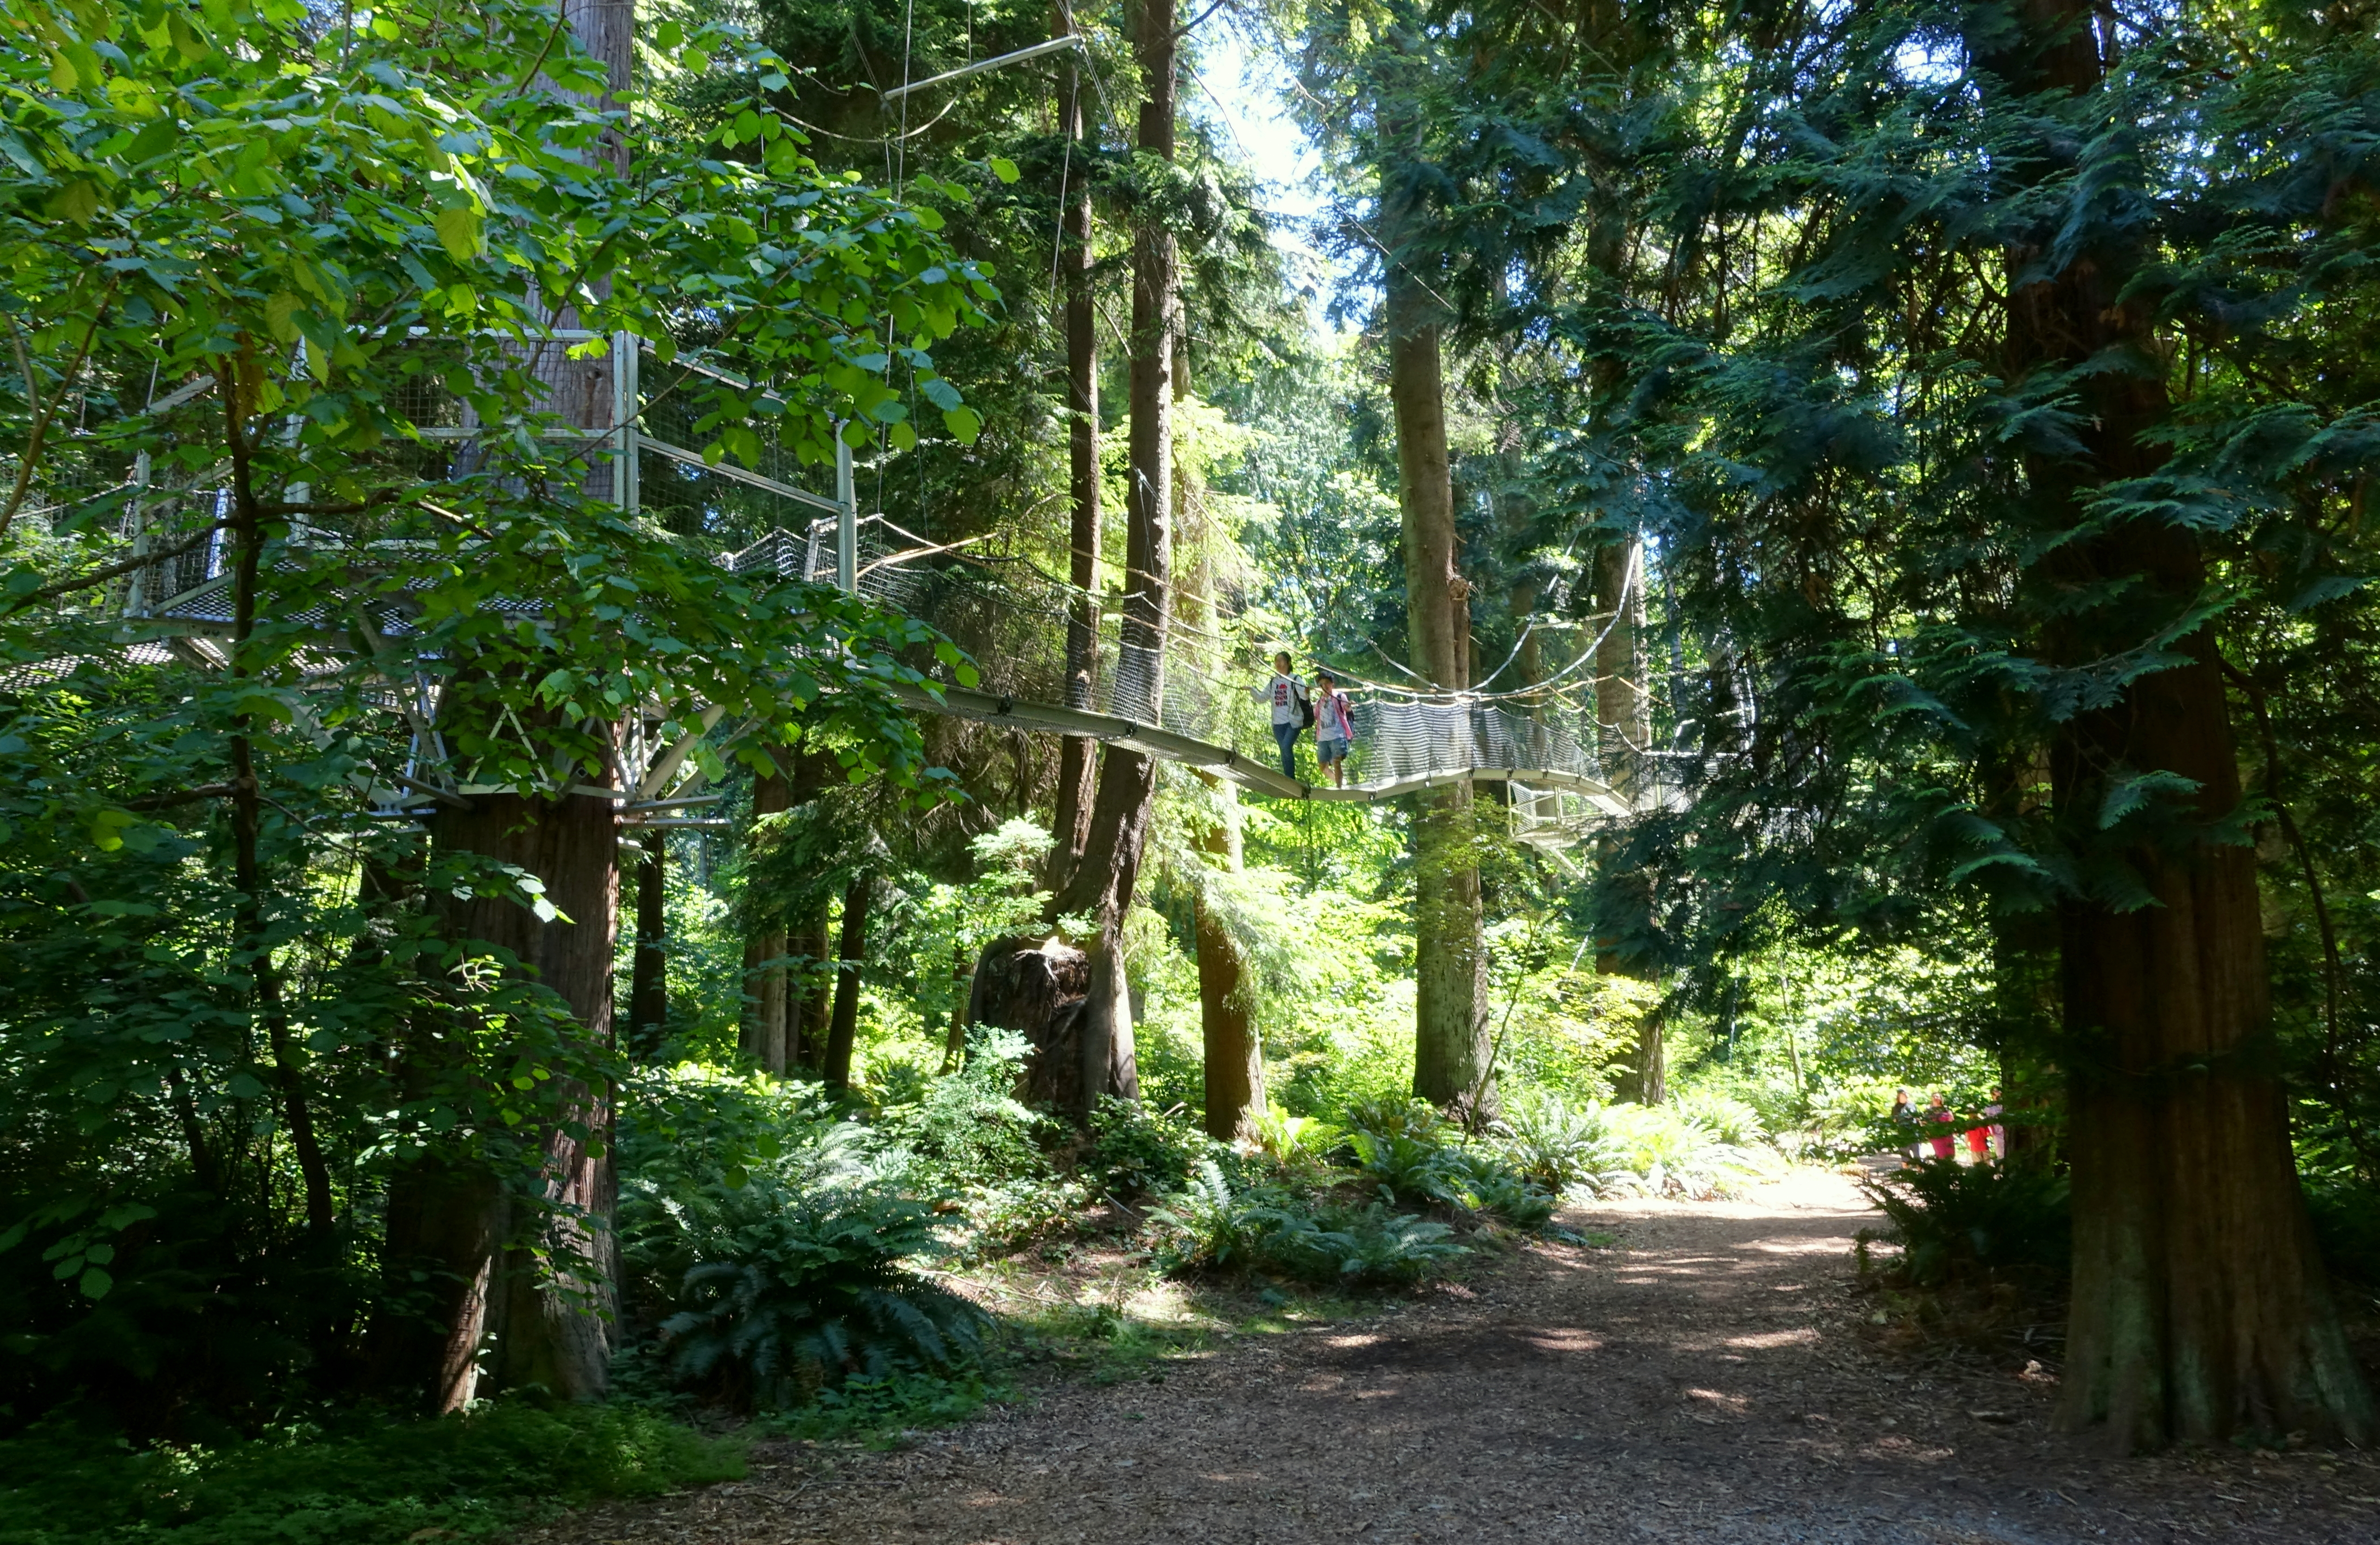 Greenheart TreeWalk